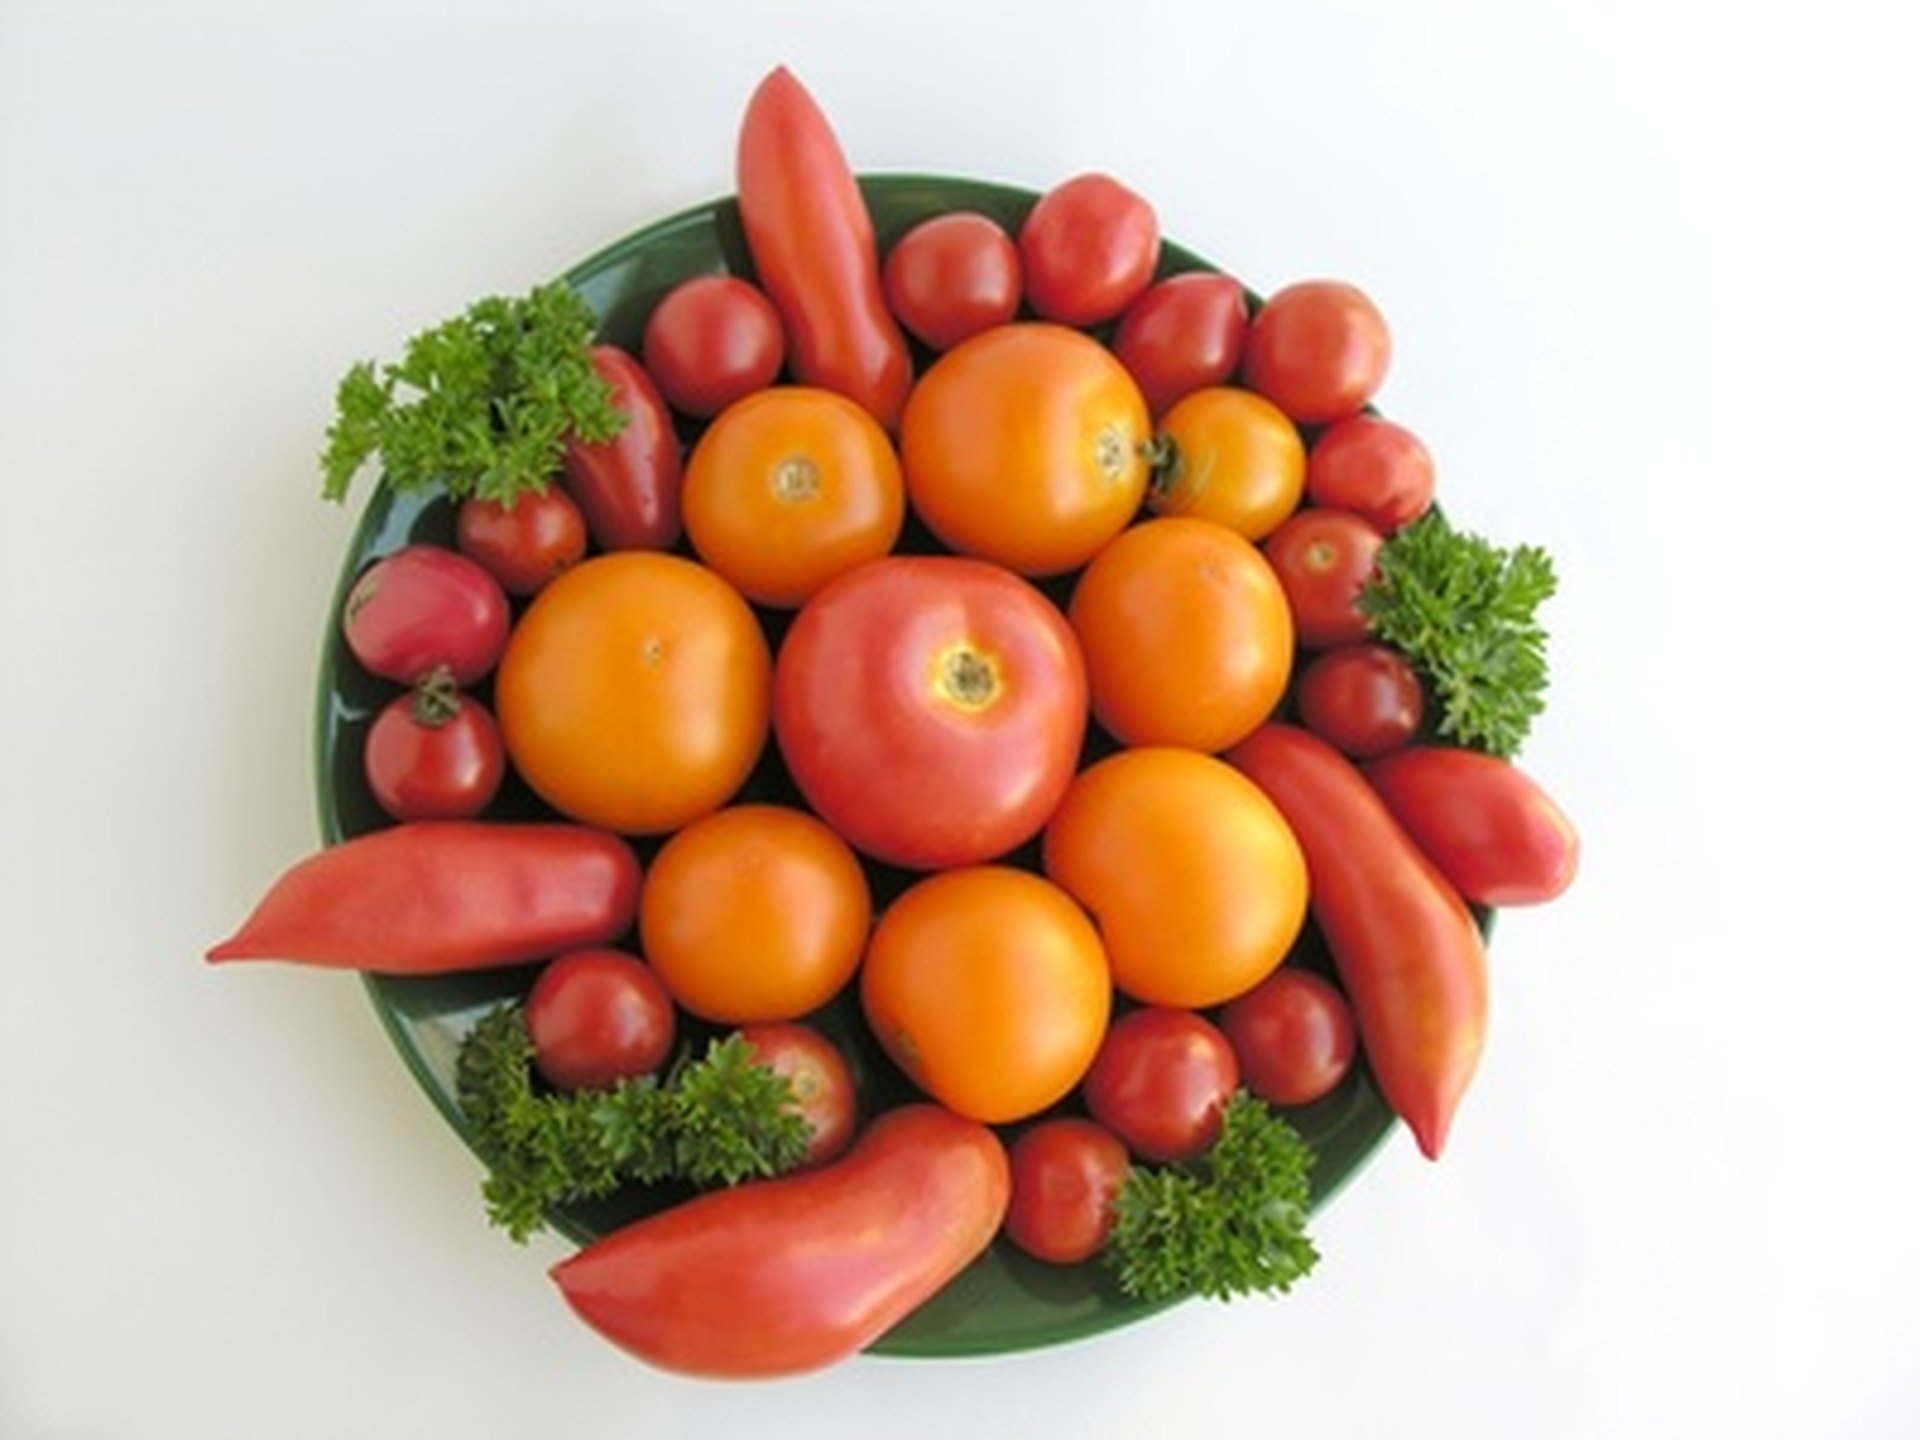 Can Certain Foods Improve Semen Volume